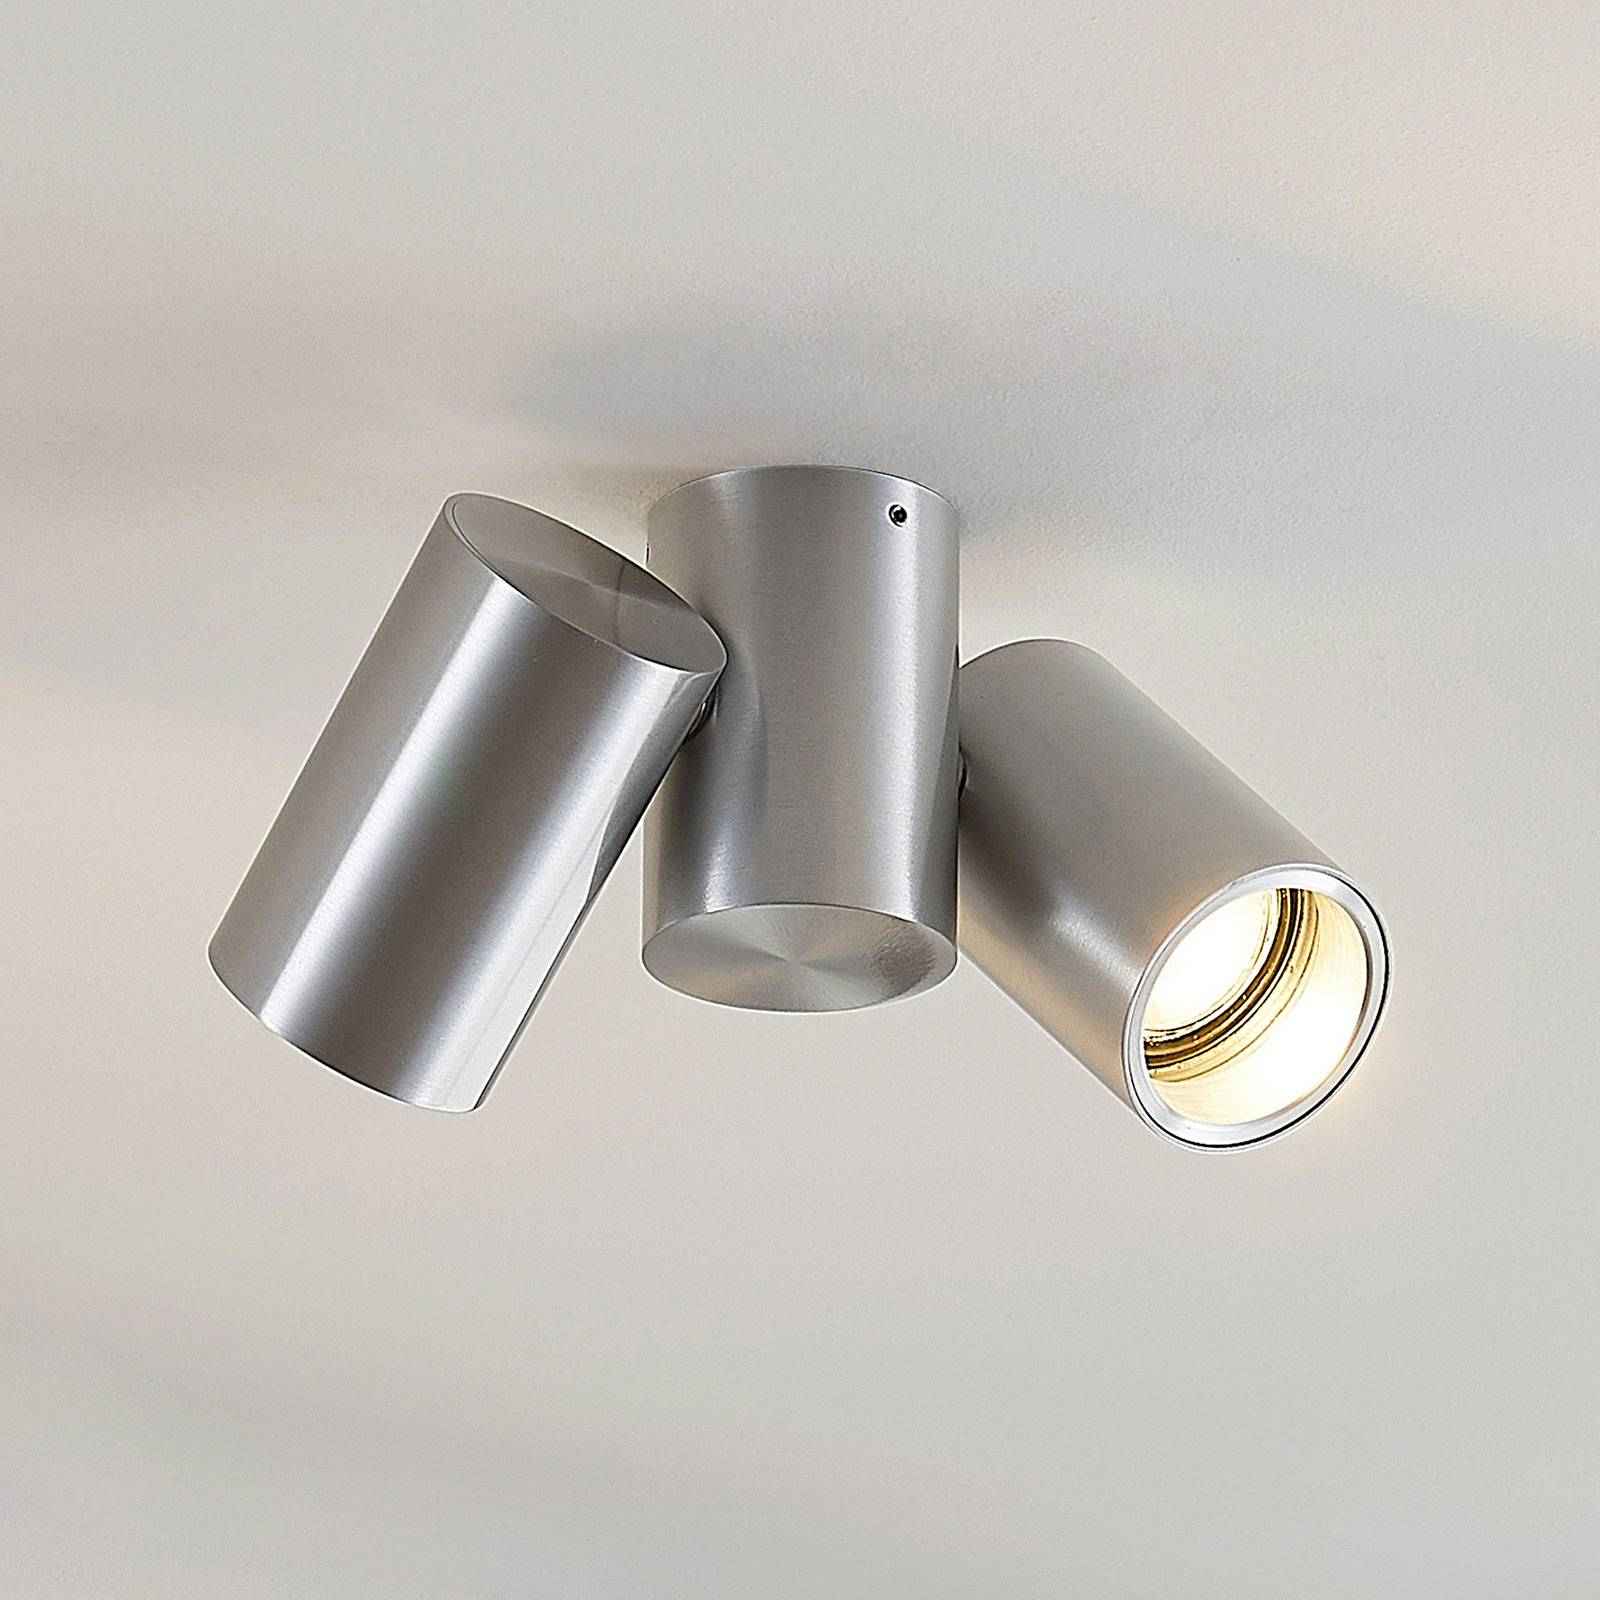 Plafondlamp Gesina, twee lampjes, alu